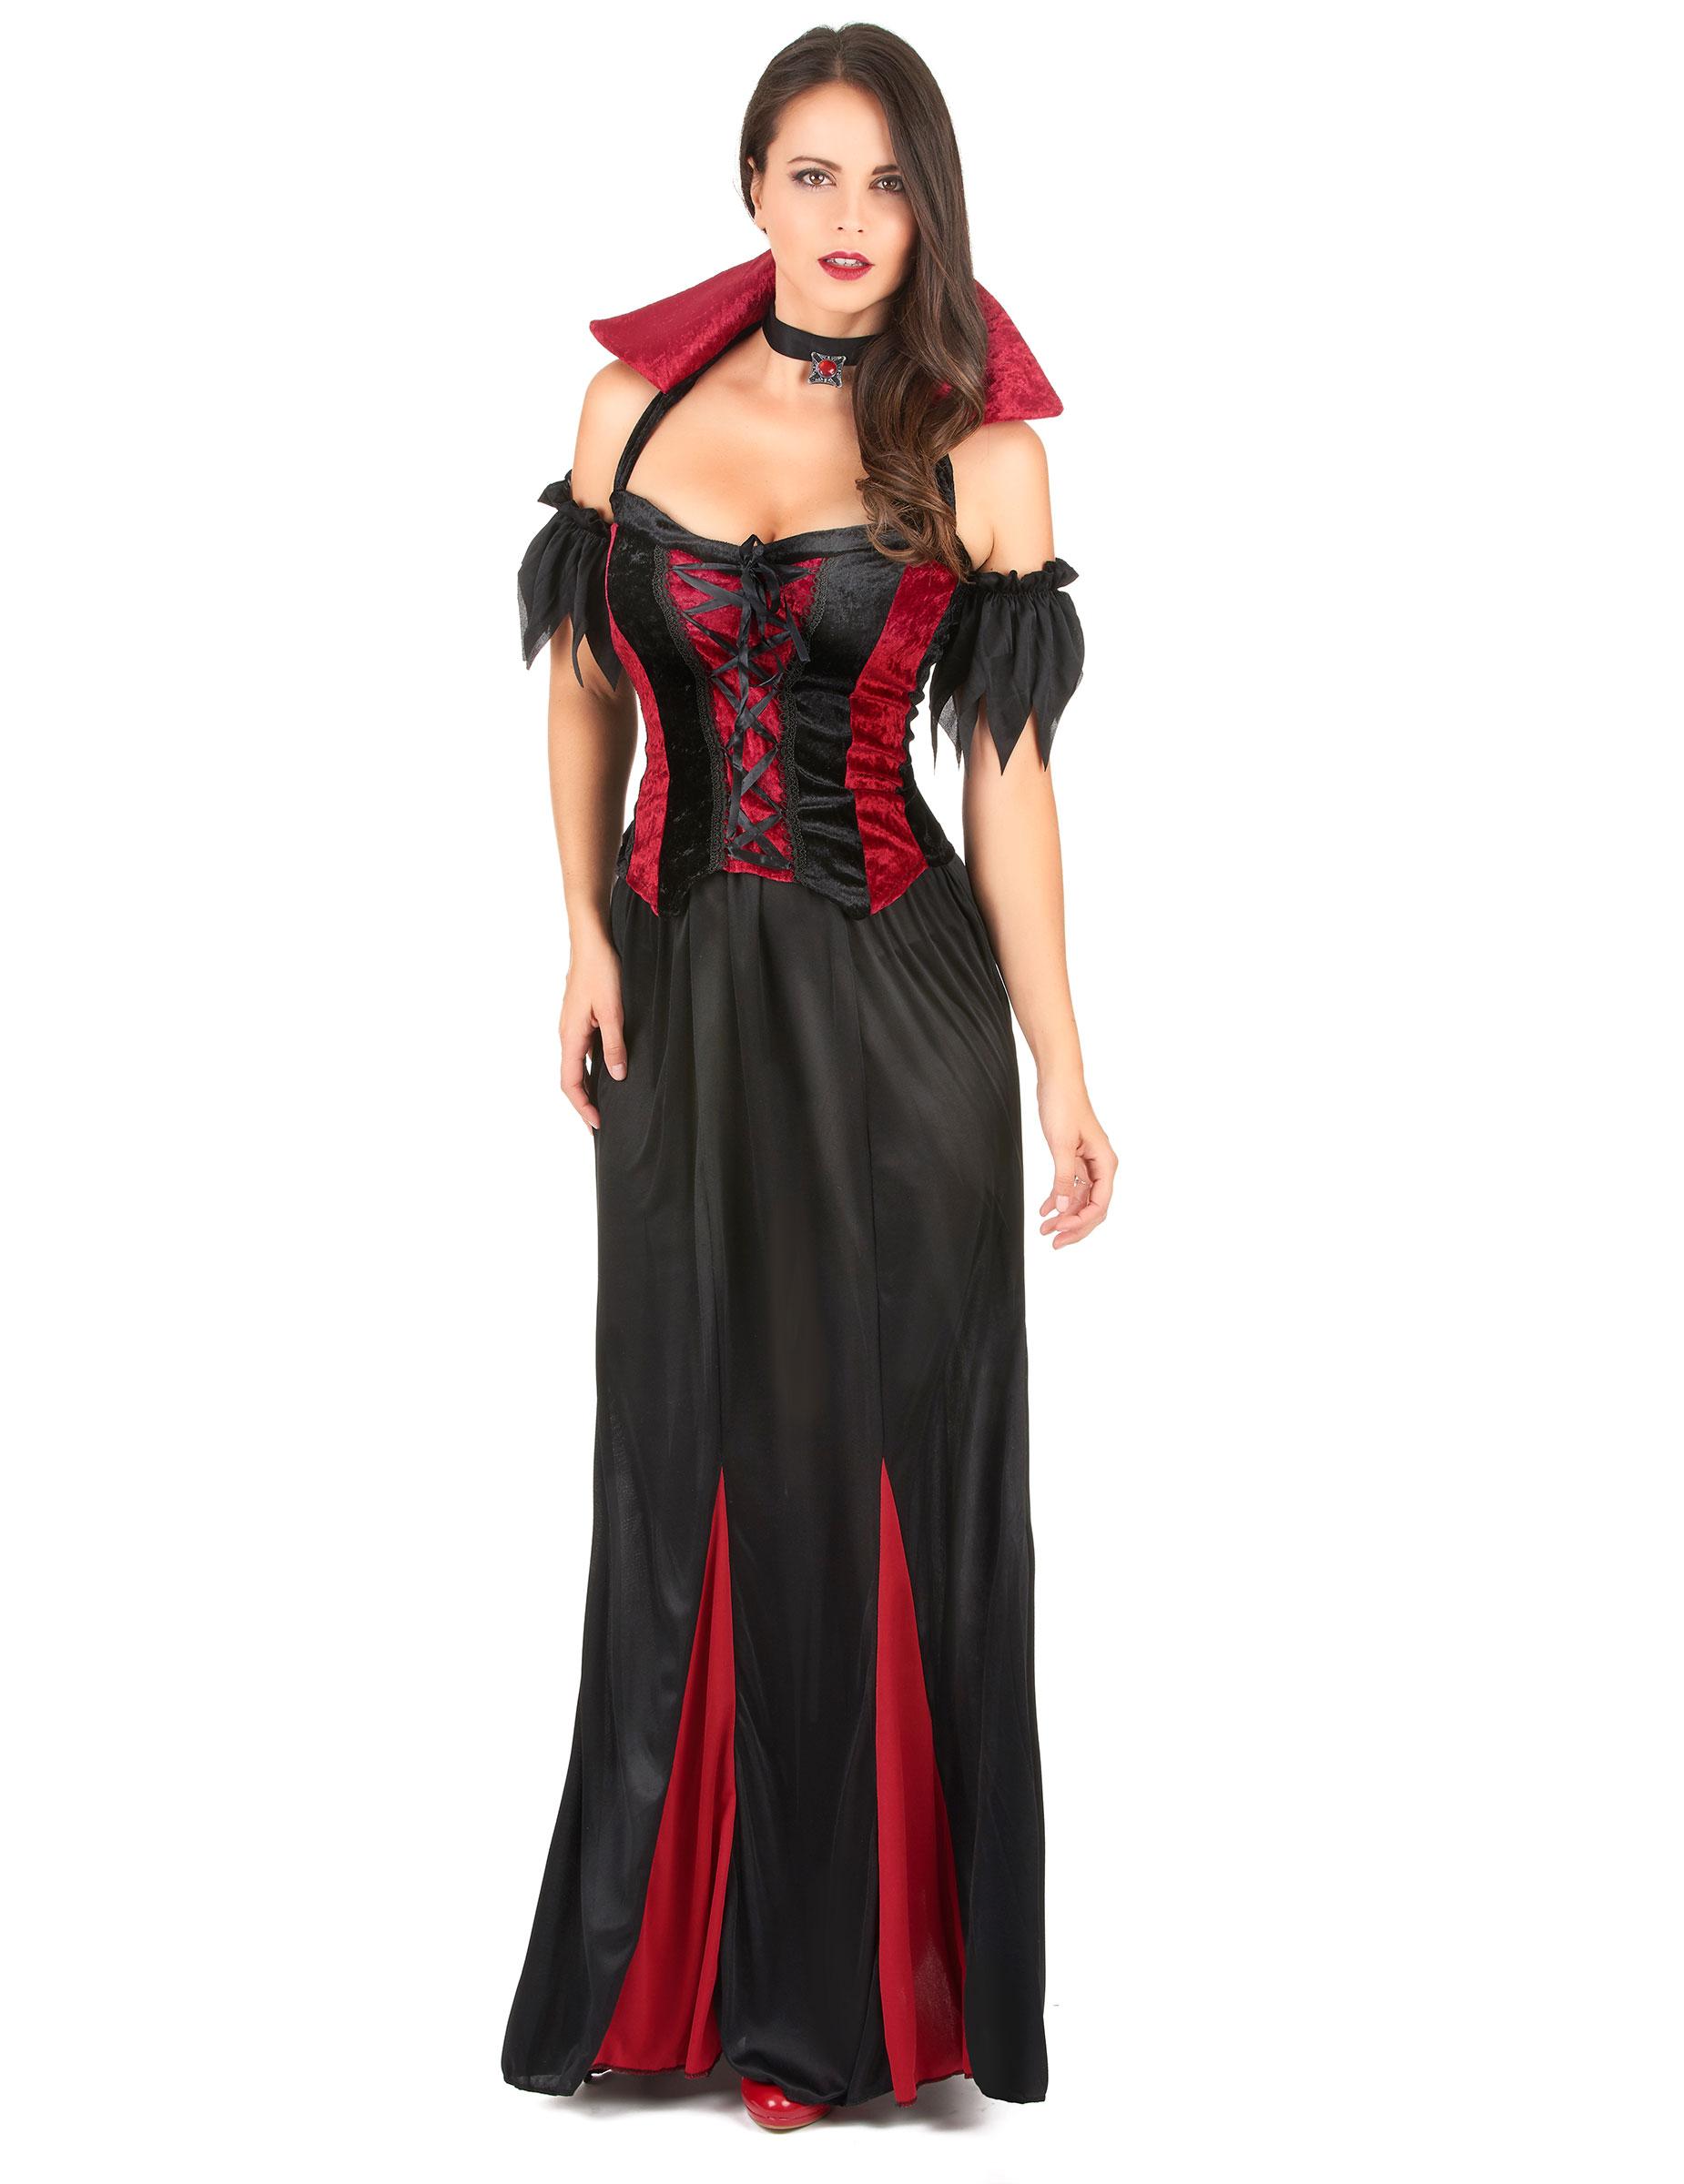 de vampiresa para mujer ideal para Halloween